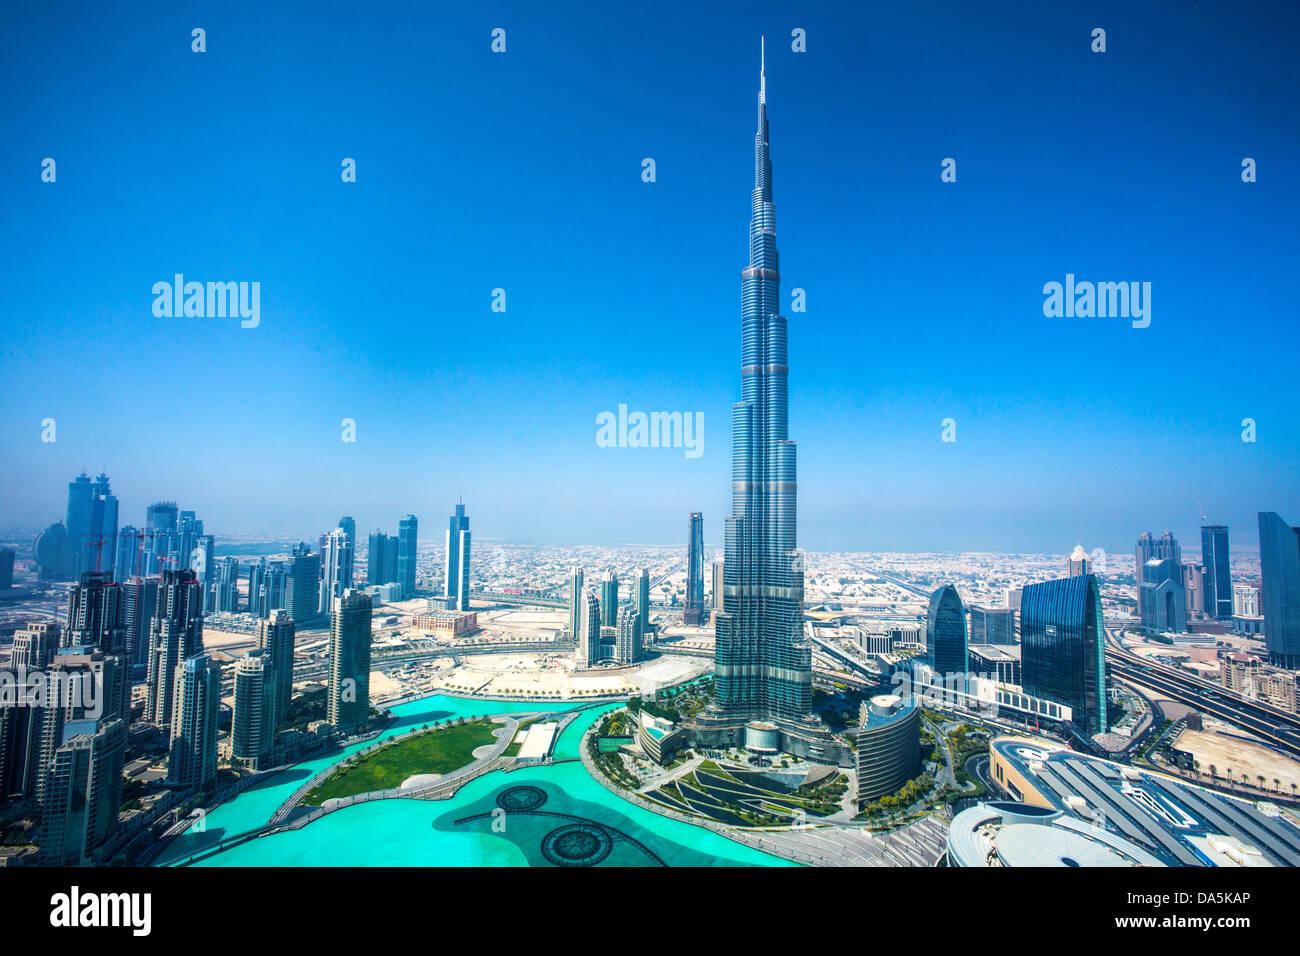 United Arab Emirates, UAE, Dubai, City, Burj, Khalifa, architecture, center, desert, design, downtown, futuristic, - Stock Image